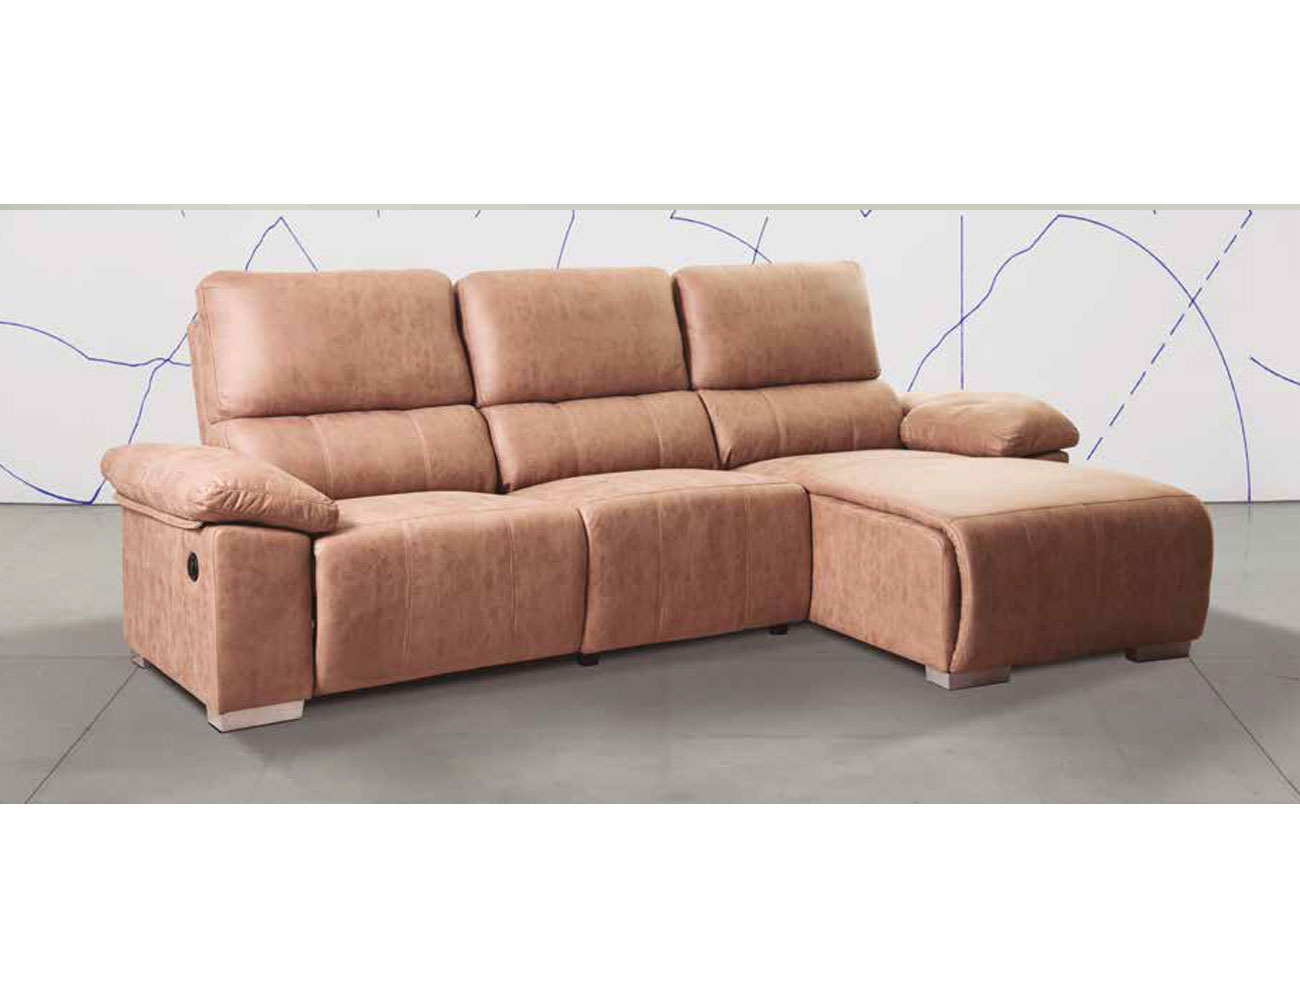 Sofa india piedra